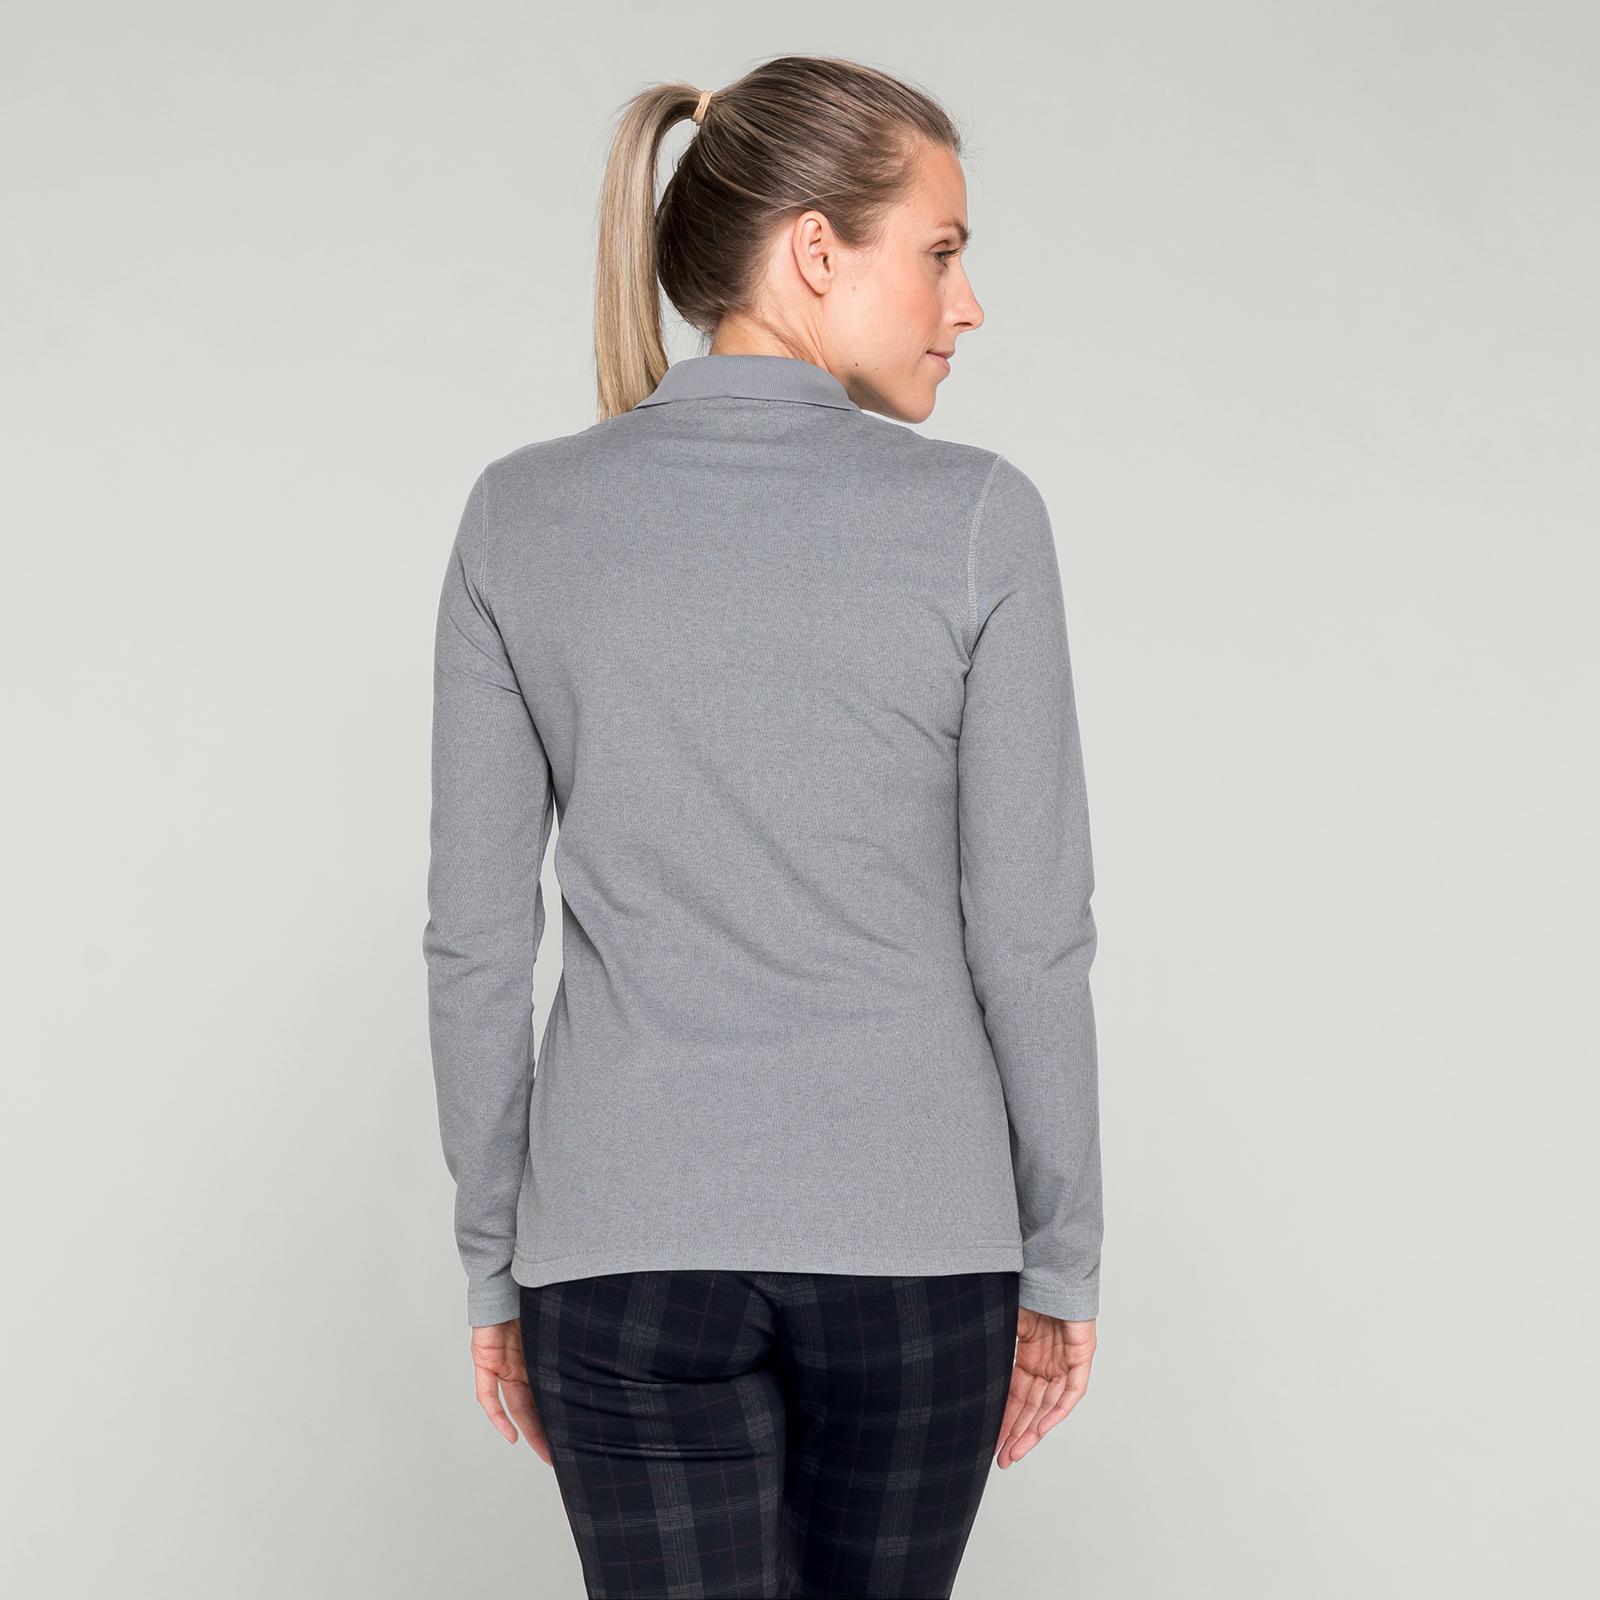 Damen Langarm Polo mit UV-Schutz